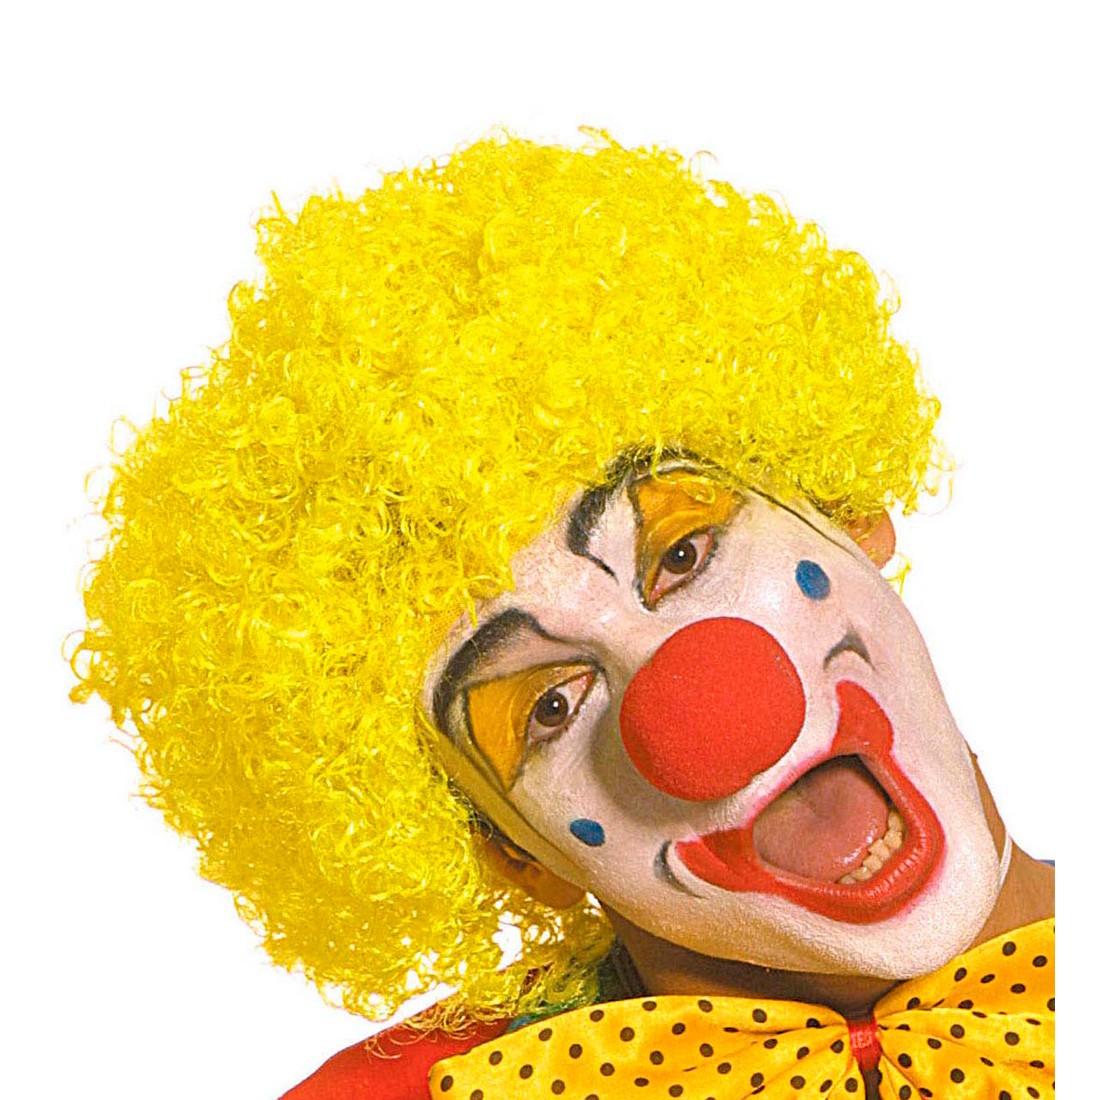 Karneval Clown Perucke Gelb Faschingsperucke 7 99